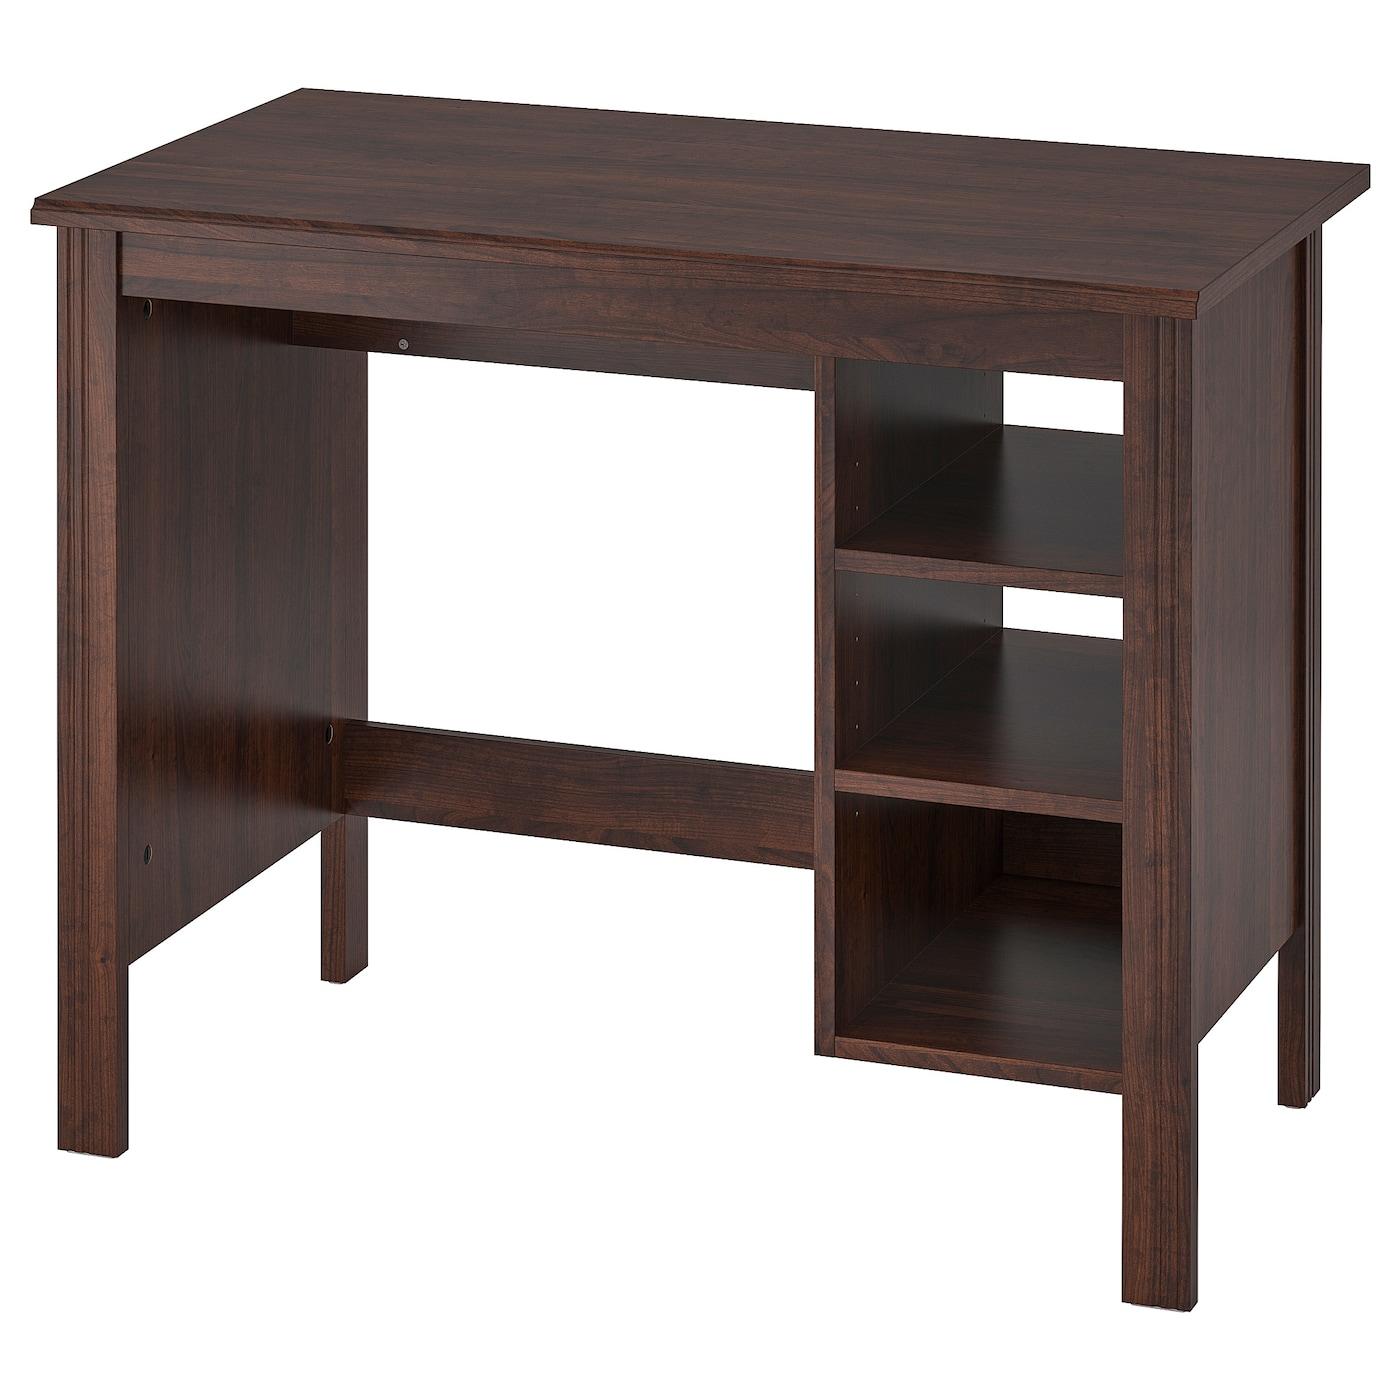 Brusali Desk Brown 35 3 8x20 1 2 Ikea